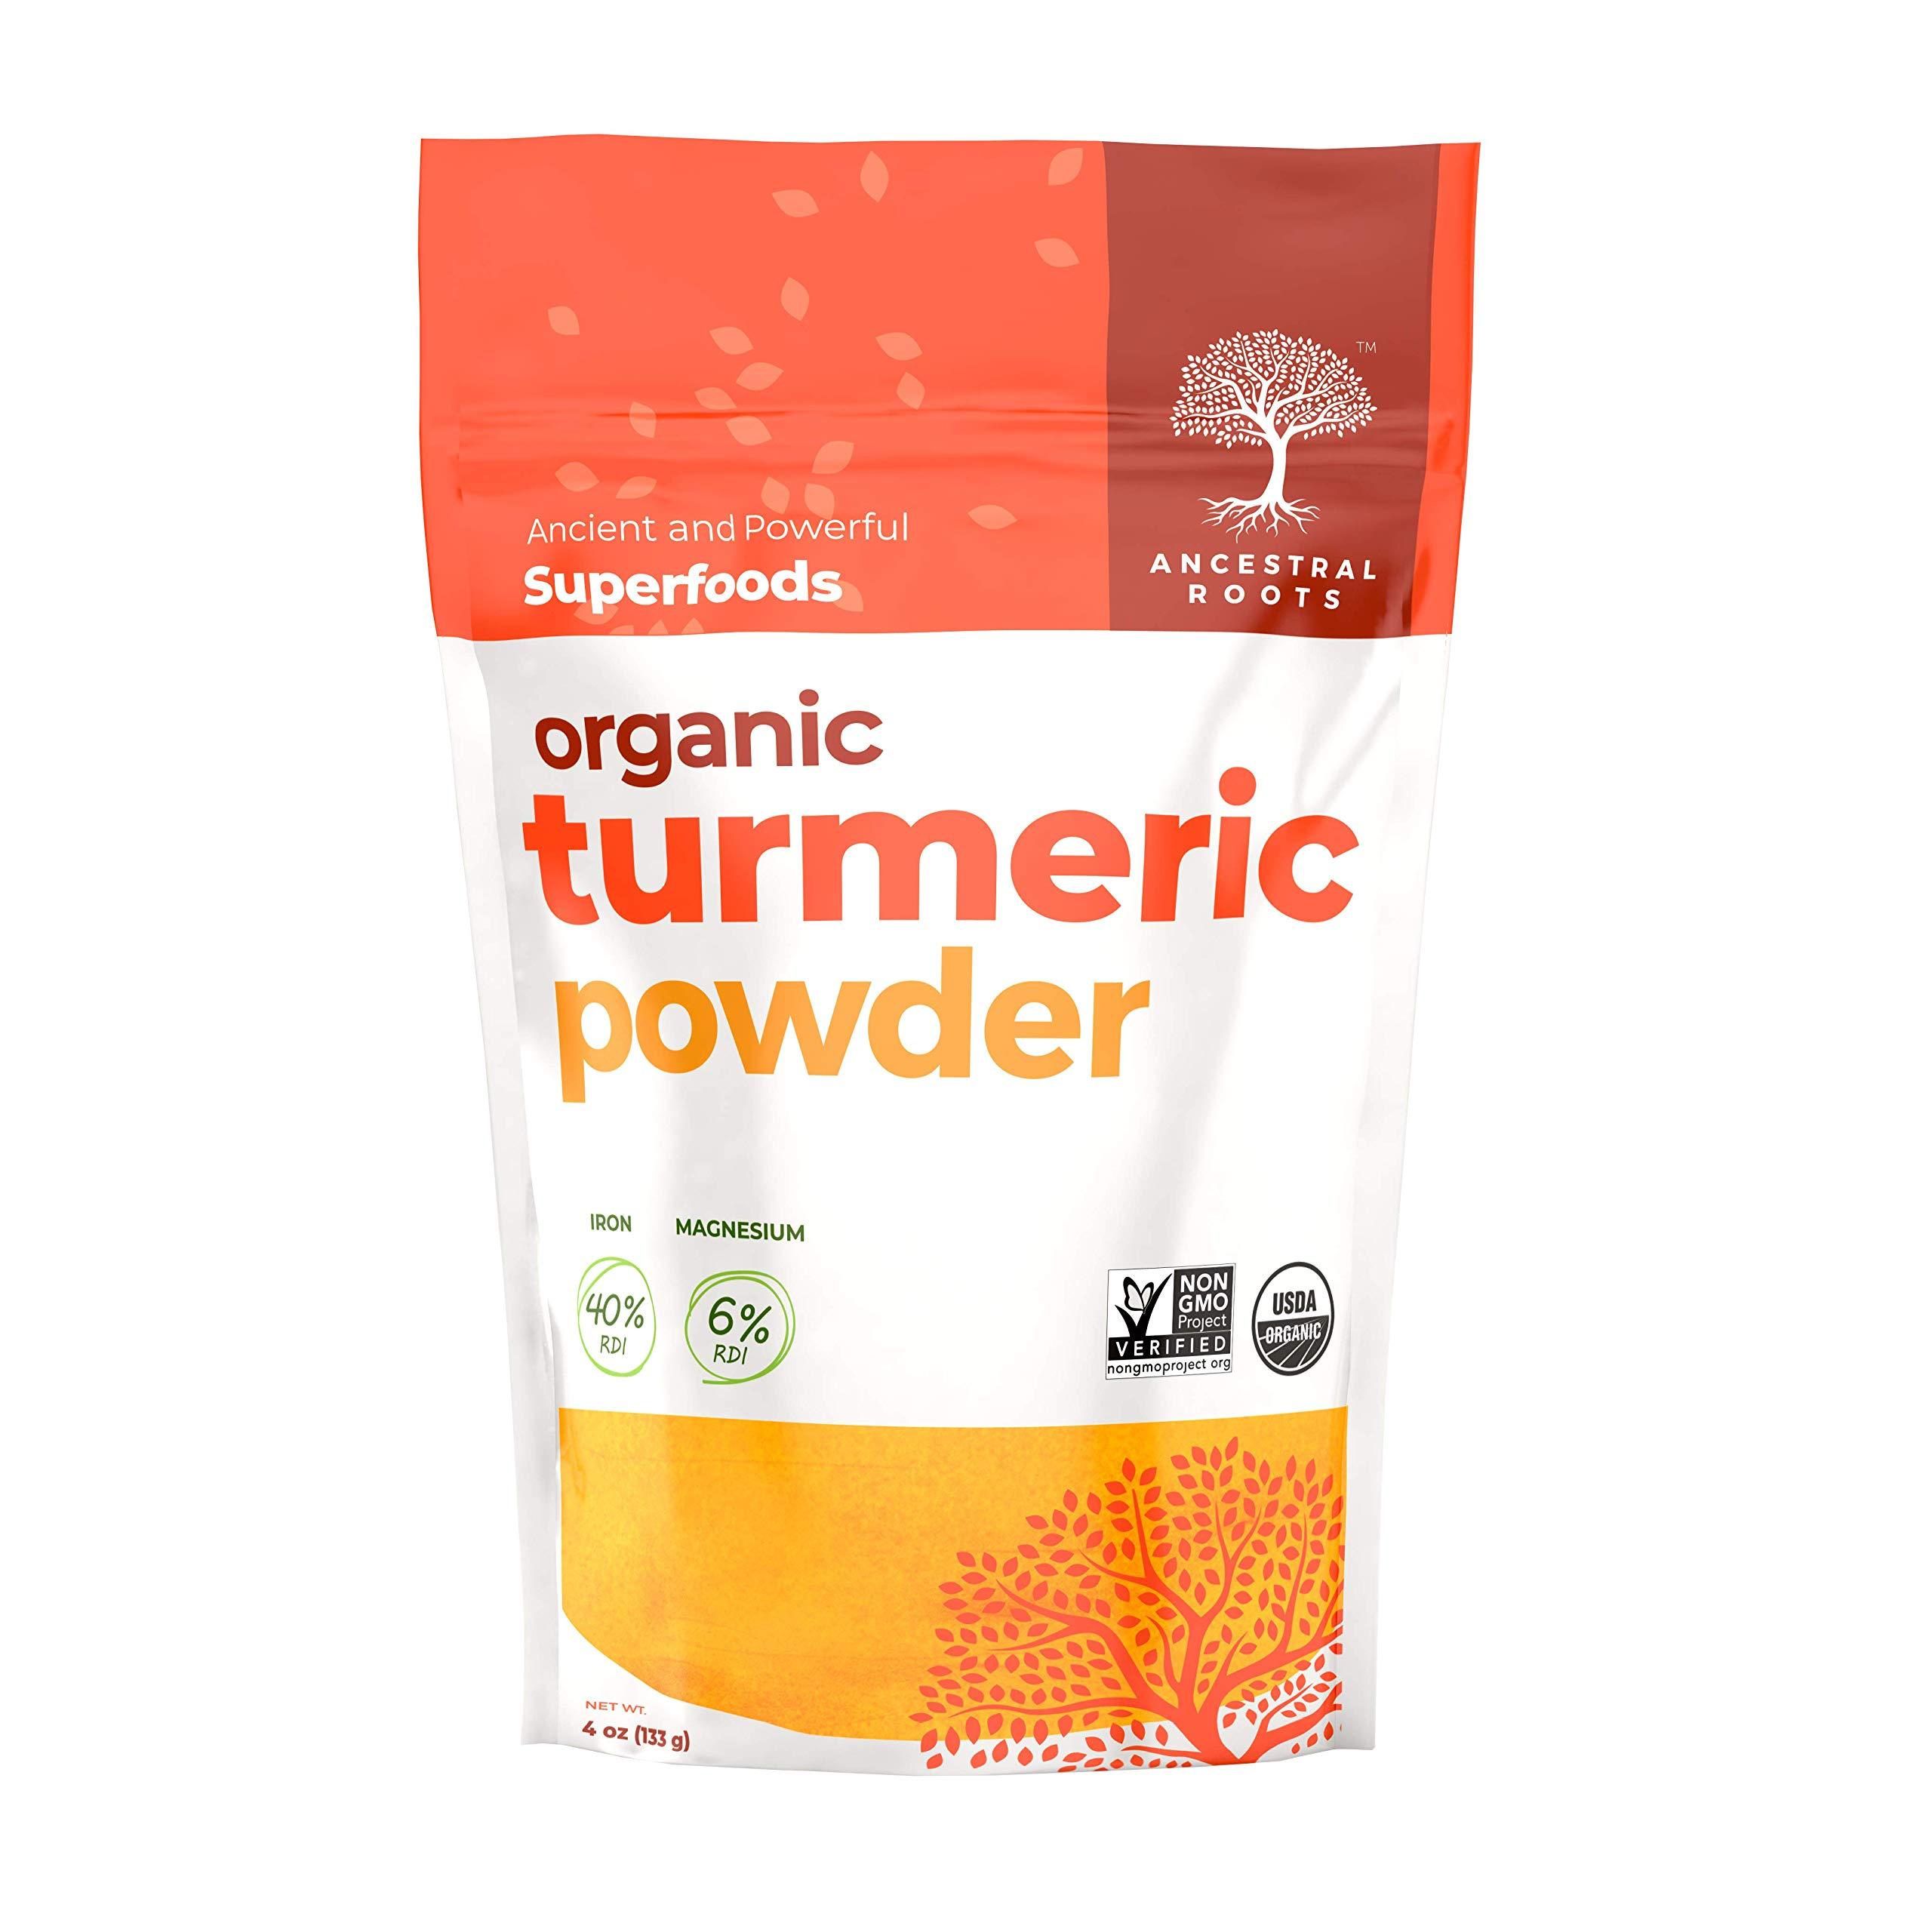 Ancestral Roots Organic Turmeric Powder - 100% Pure, USDA Certified Organic Turmeric Powder (4 oz)